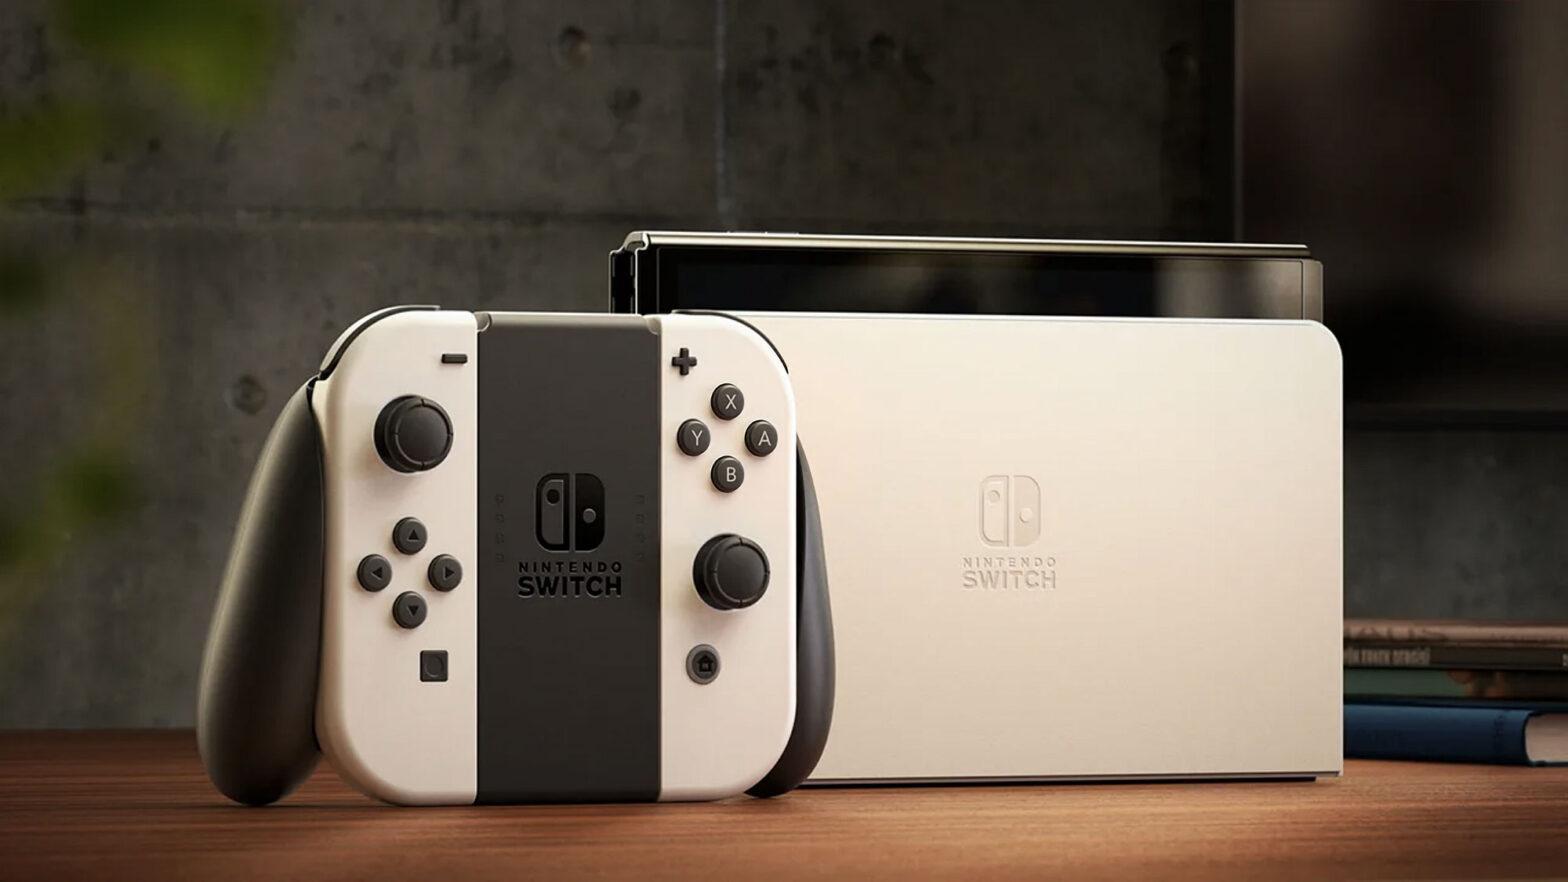 Nintendo Switch OLED Model Announced